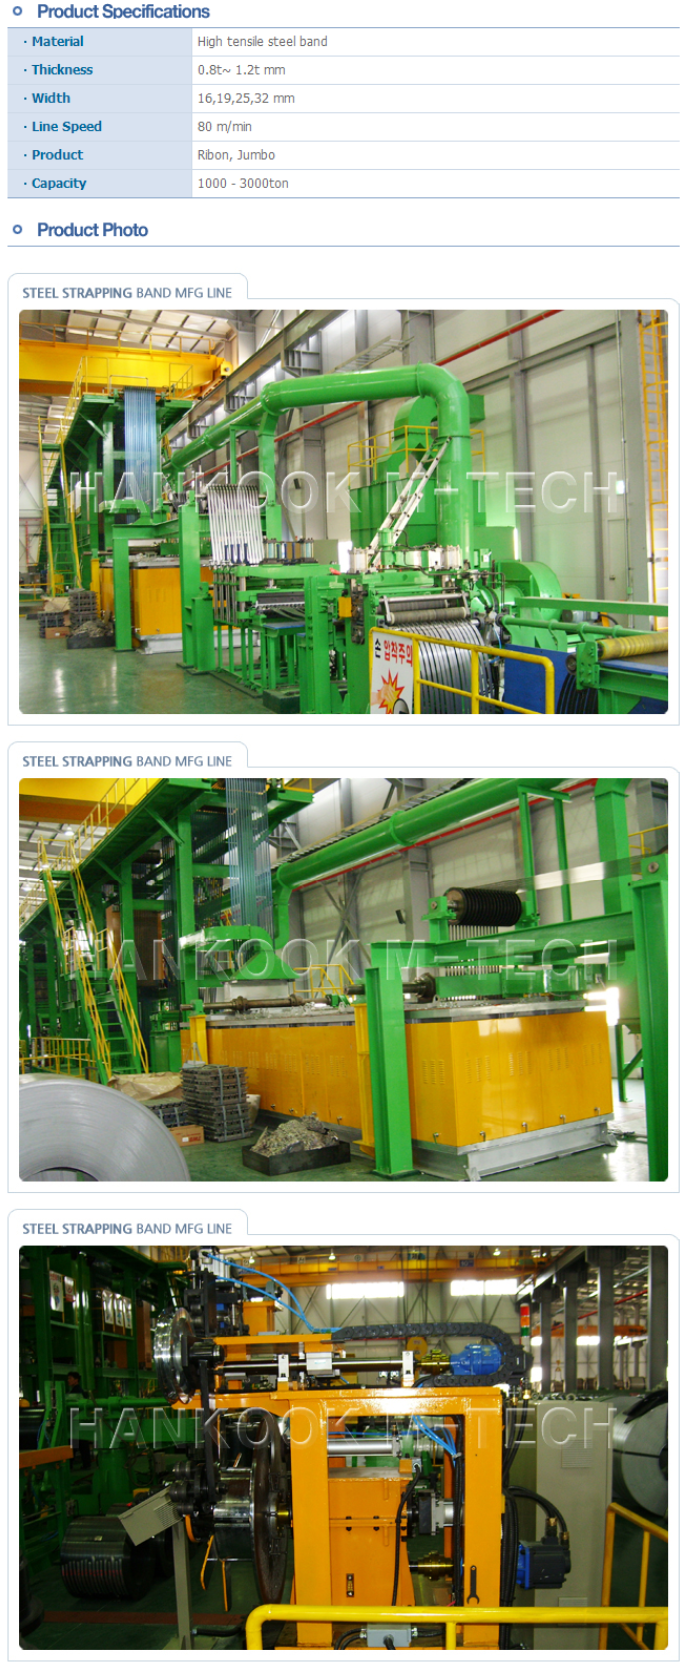 HWA SEONG B & TEC Process & Service Line  4